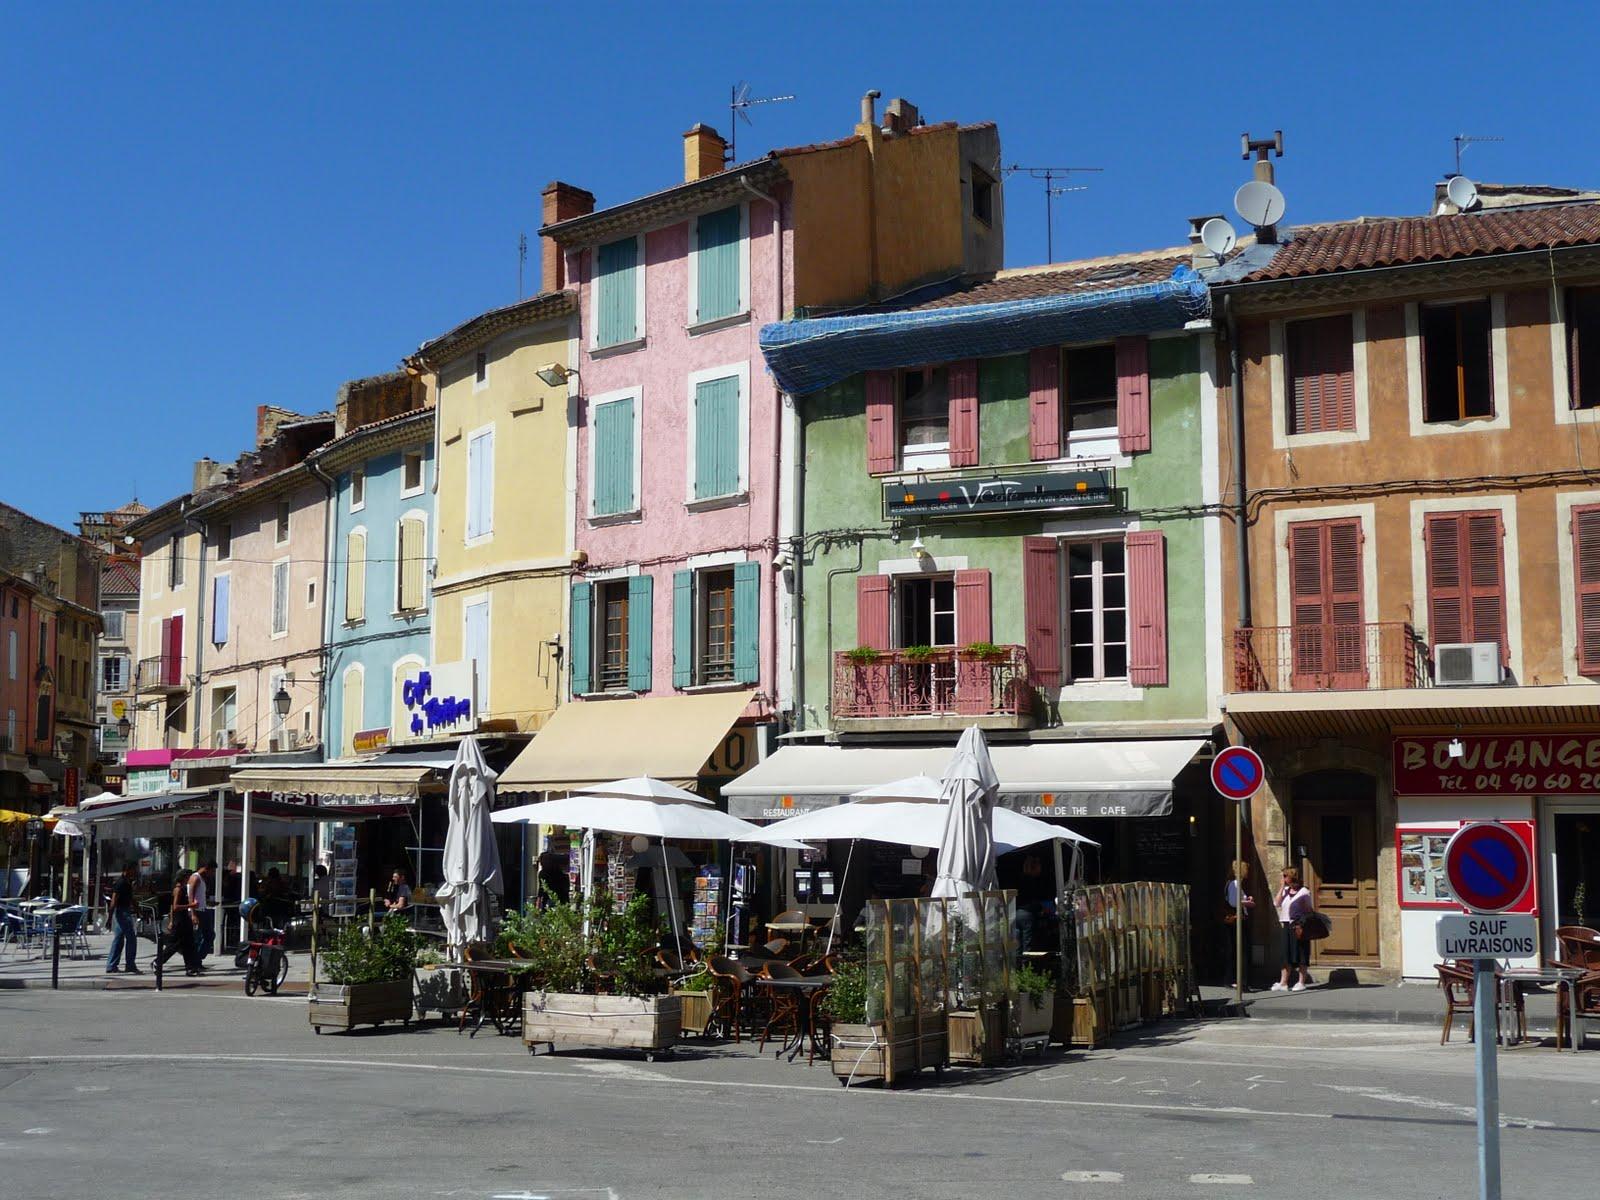 le Urbaniak-Dornstauder's Bonjour de France: APRIL-Orange ...  le Urbaniak-Dor...